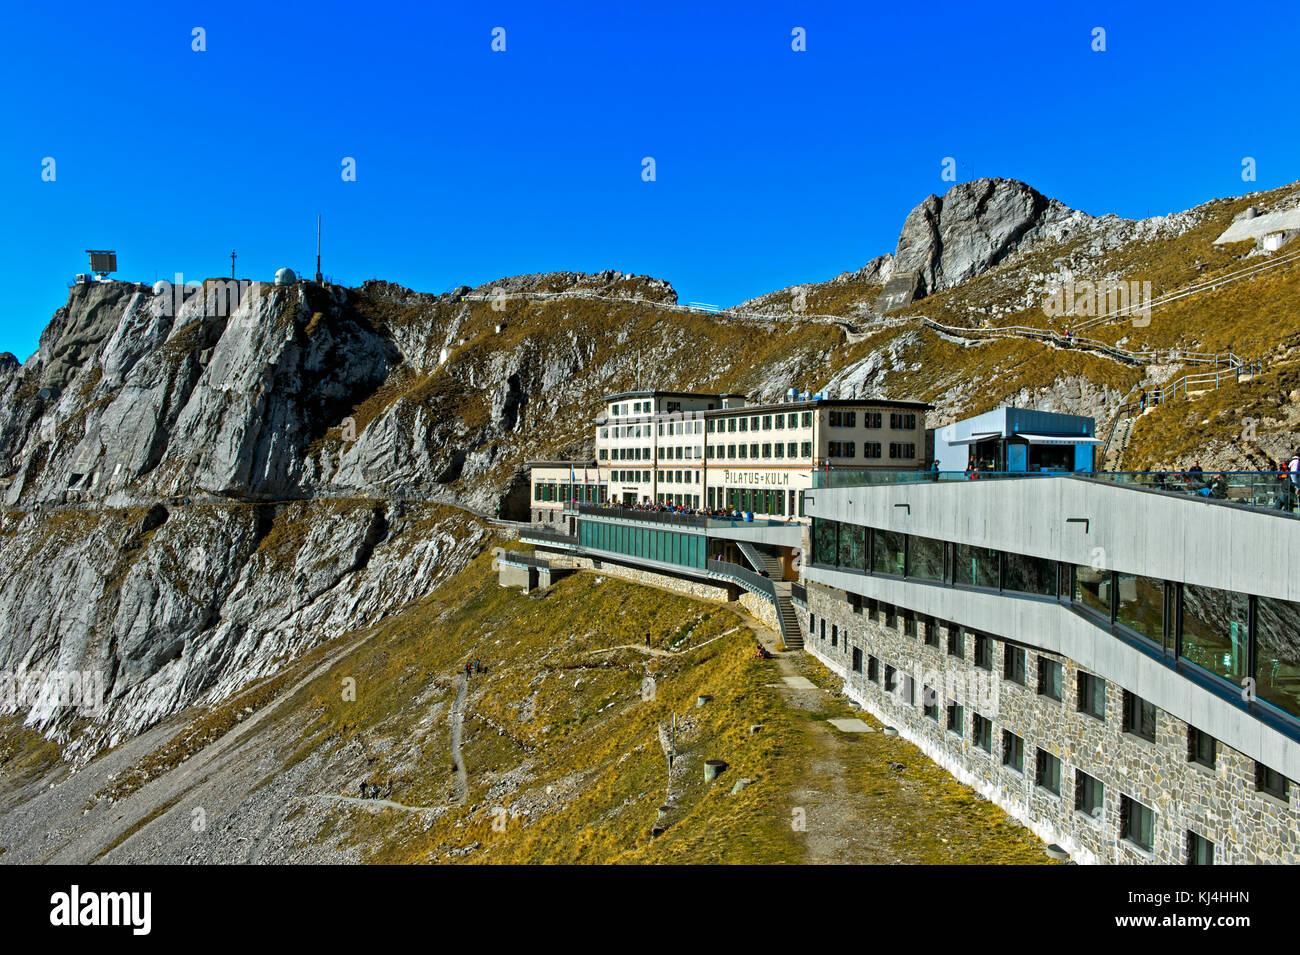 Historical mountain hotel Pilatus-Kulm on the Pilatus massif, Alpnachstad, Switzerland - Stock Image